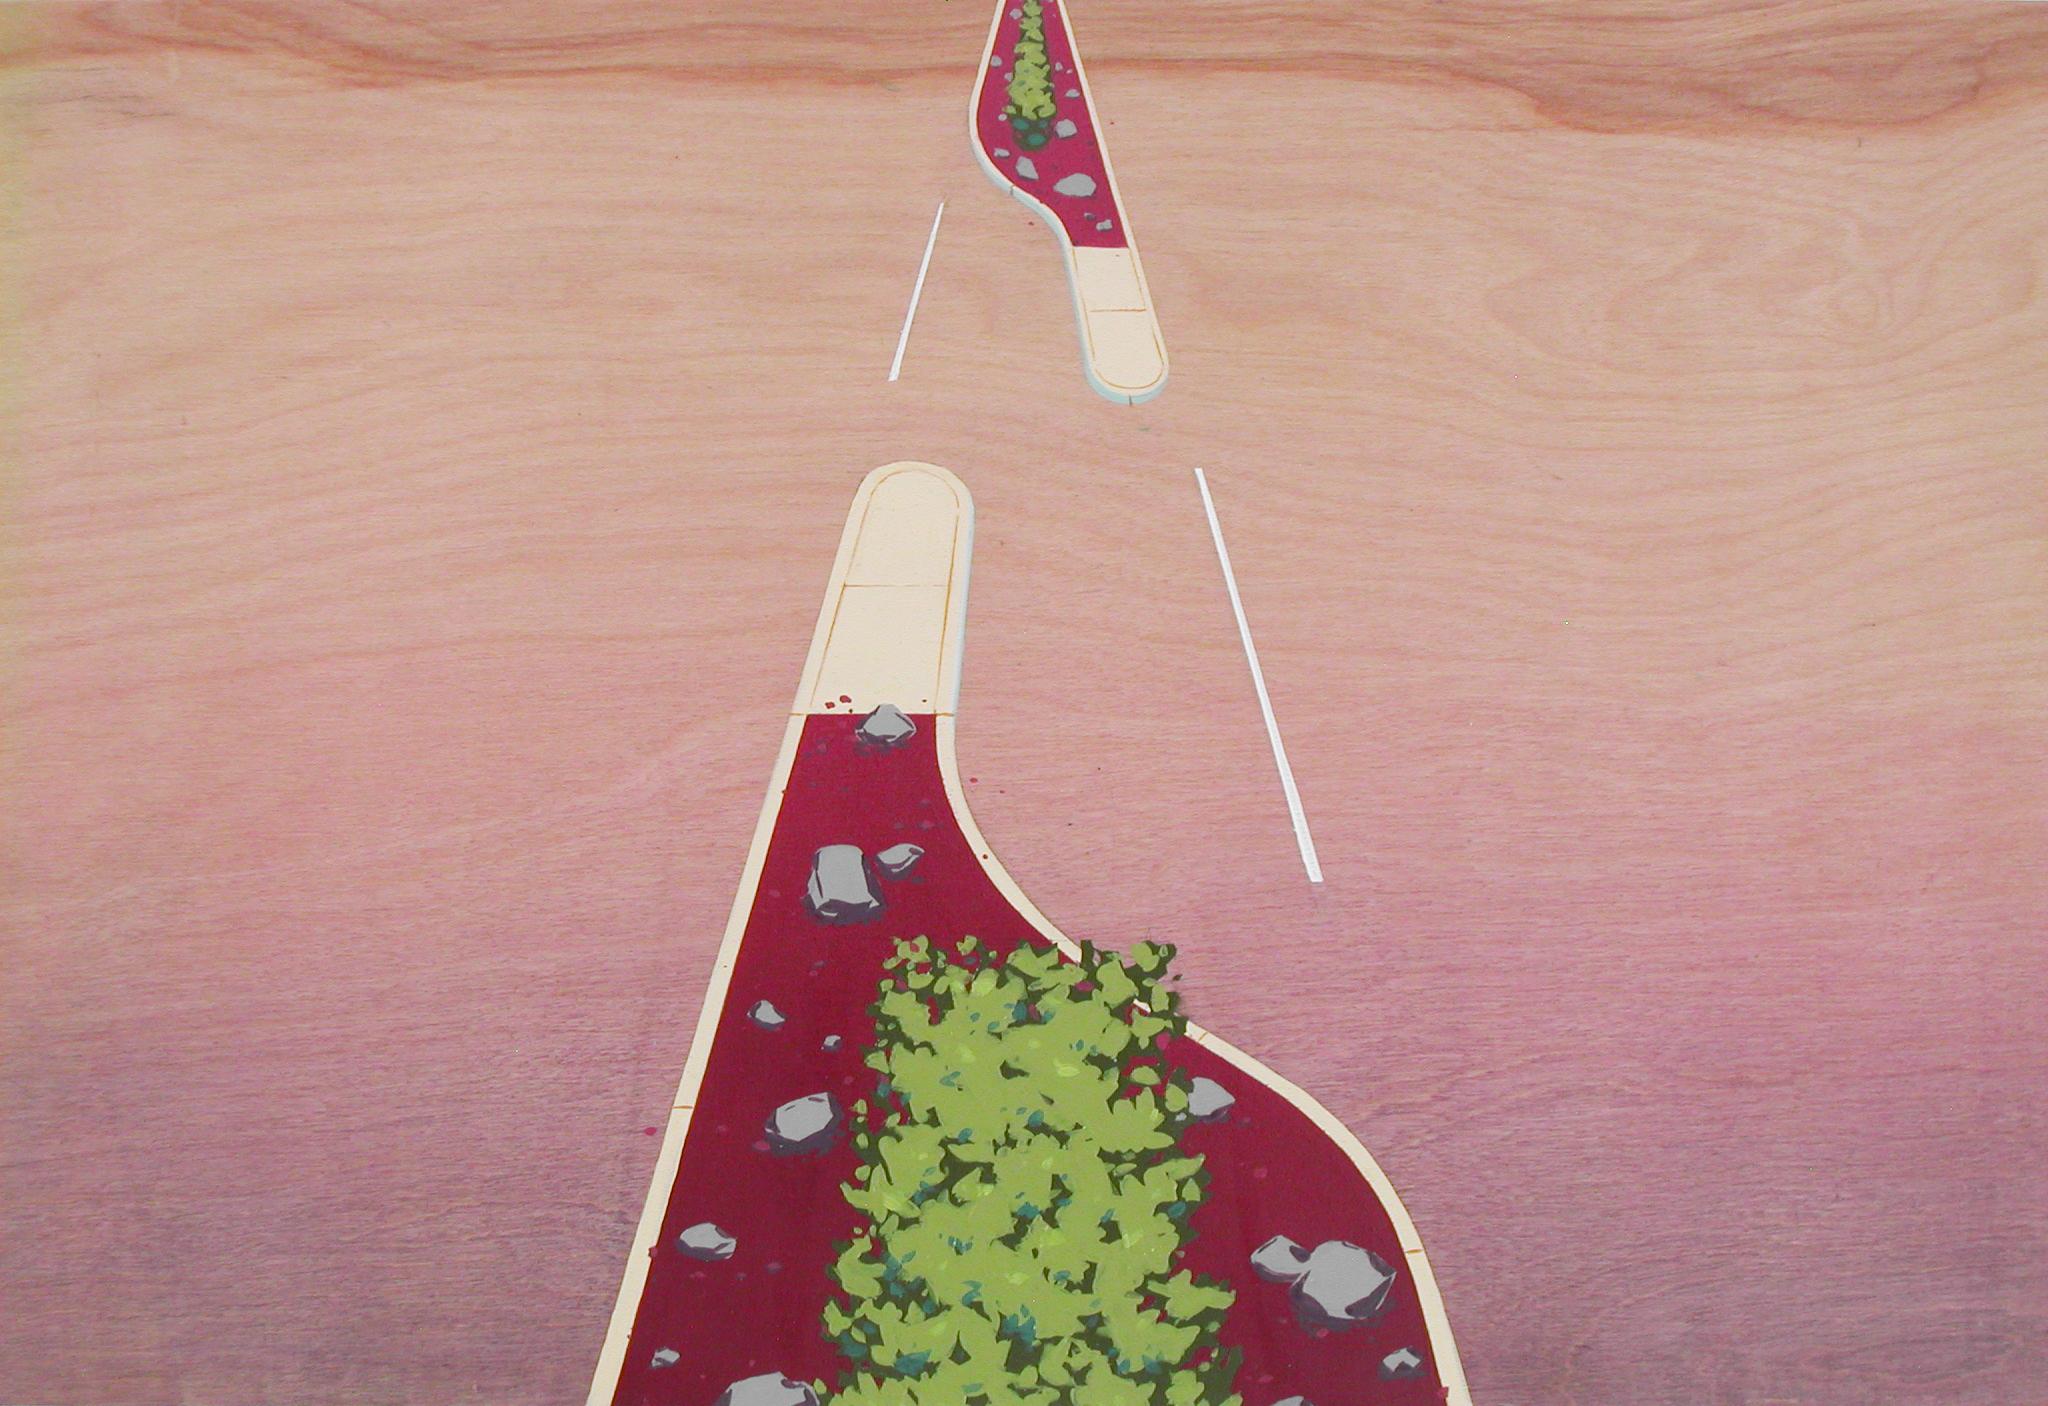 Chris Ballantyne   Median (Turn Lane)  2014 acrylic on panel 12 x 18 in